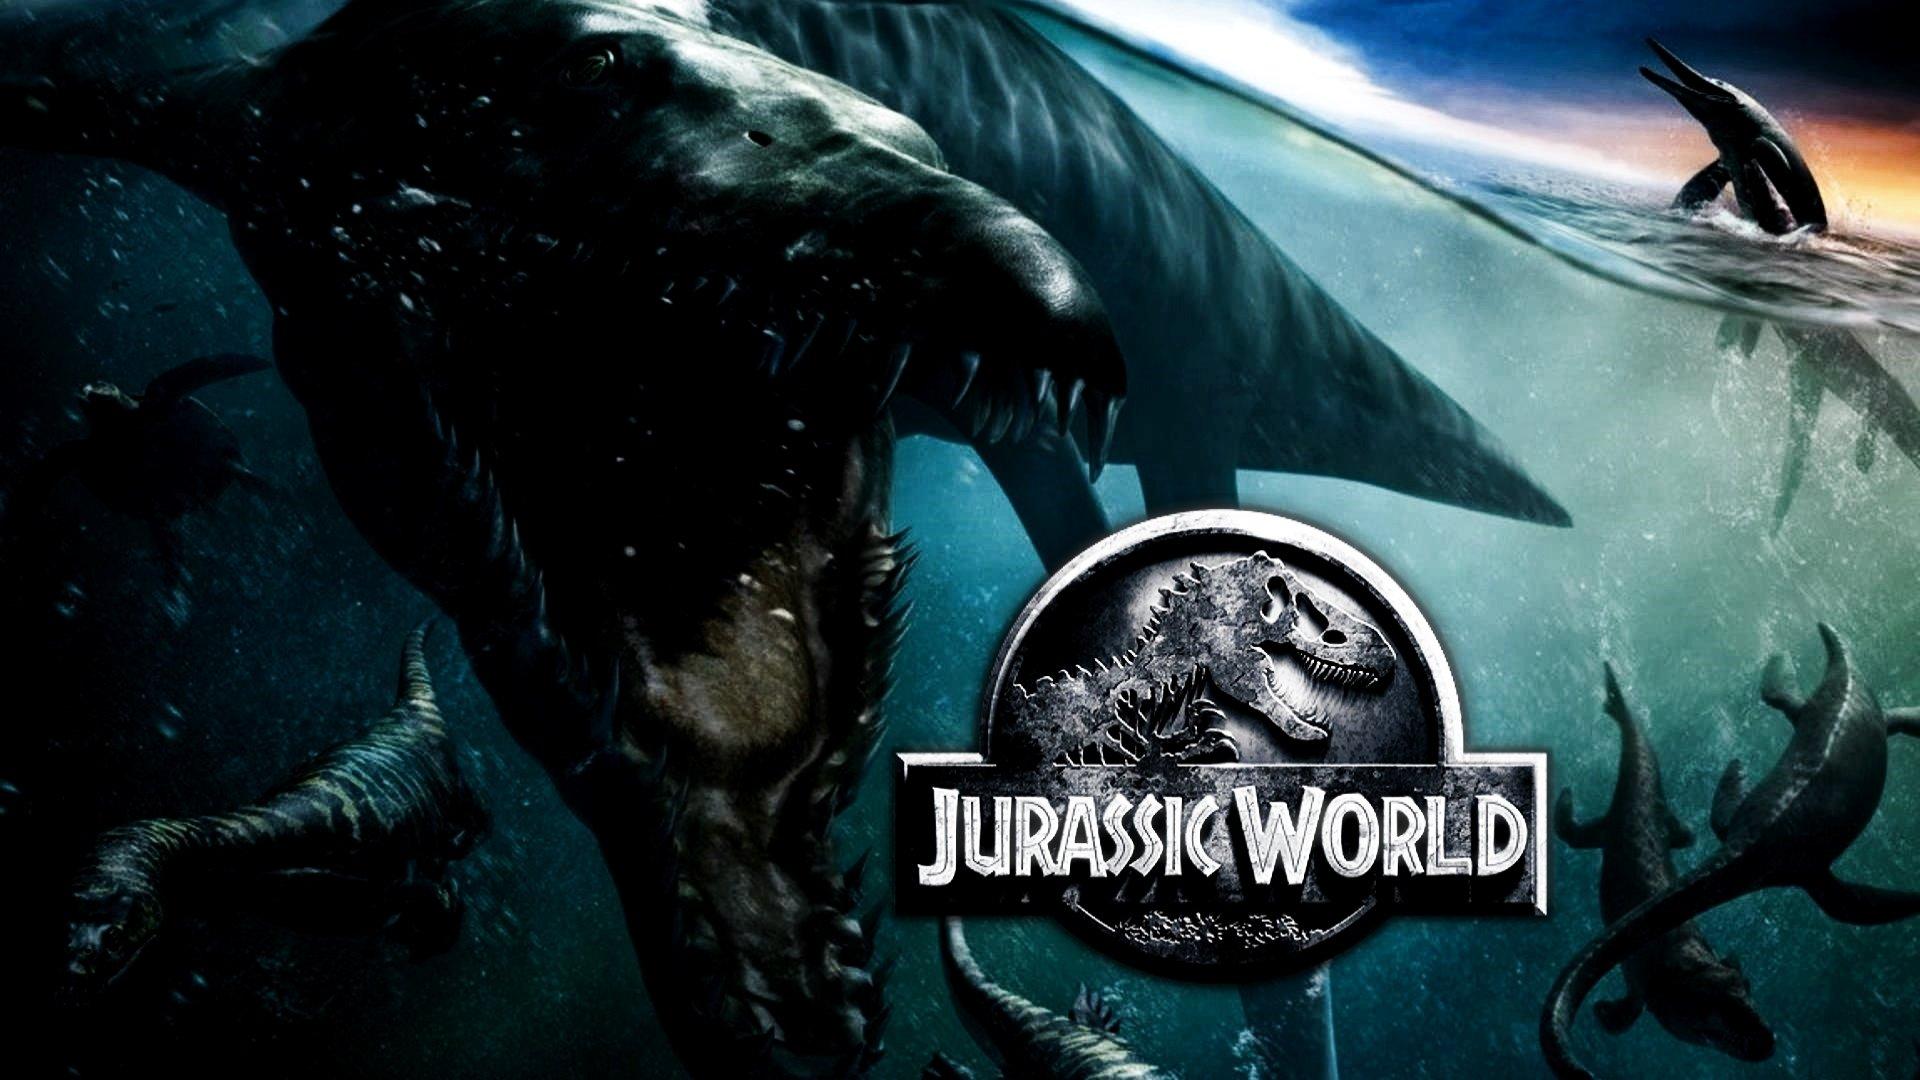 Jurassic world full hd fond d 39 cran and arri re plan 1920x1080 id 564258 - Telecharger jurassic park 4 ...